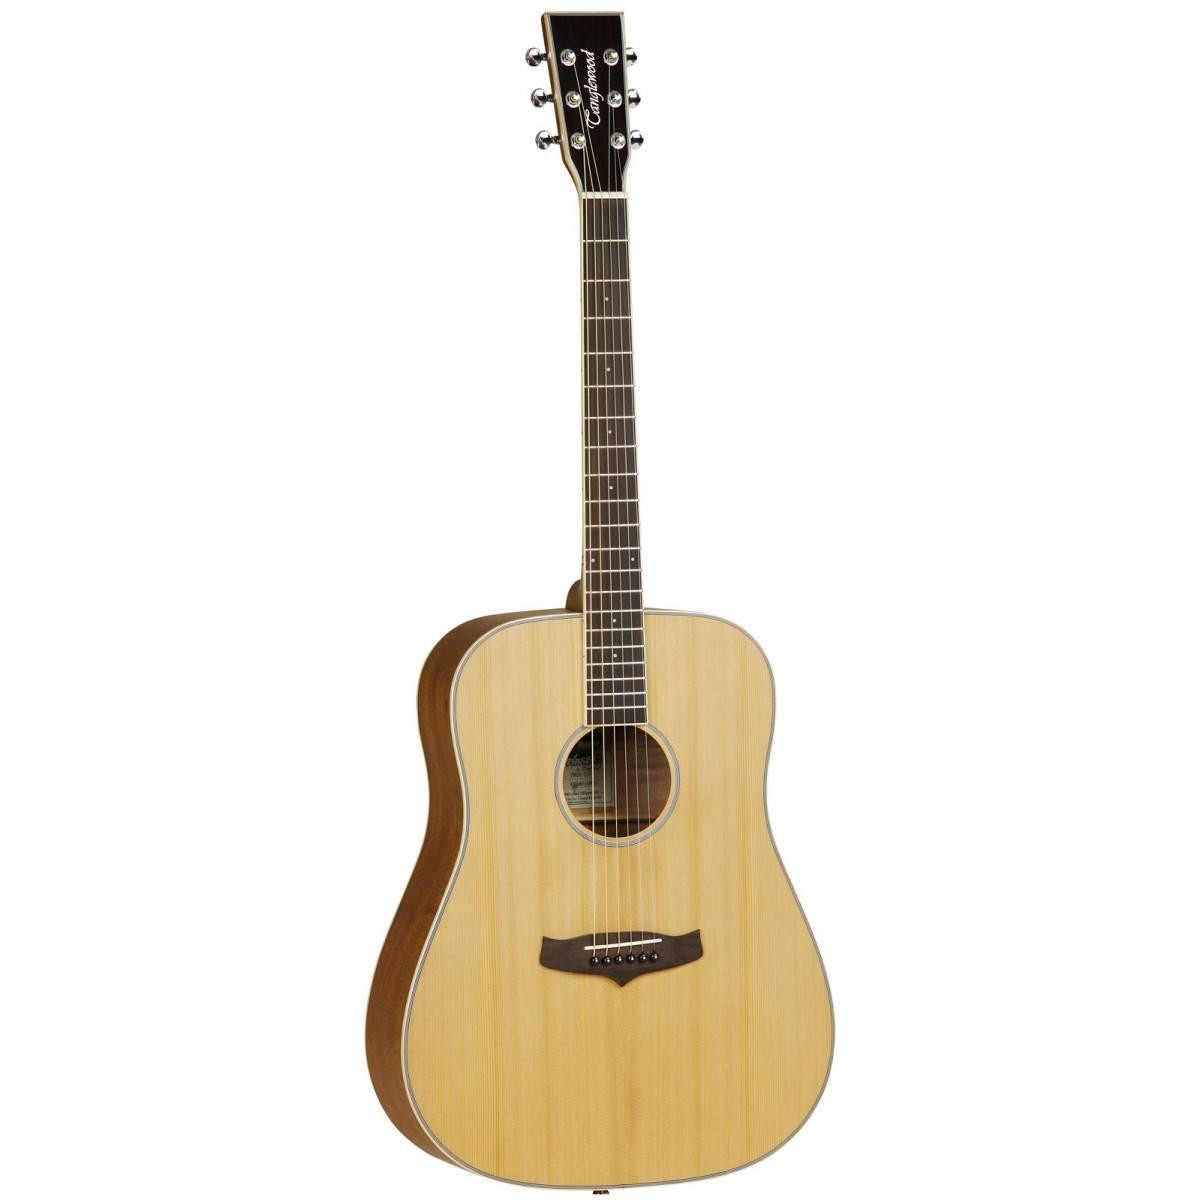 Guitare acoustique Evolution IV Dreadnought Natural Satin Tanglewood TW28CLN